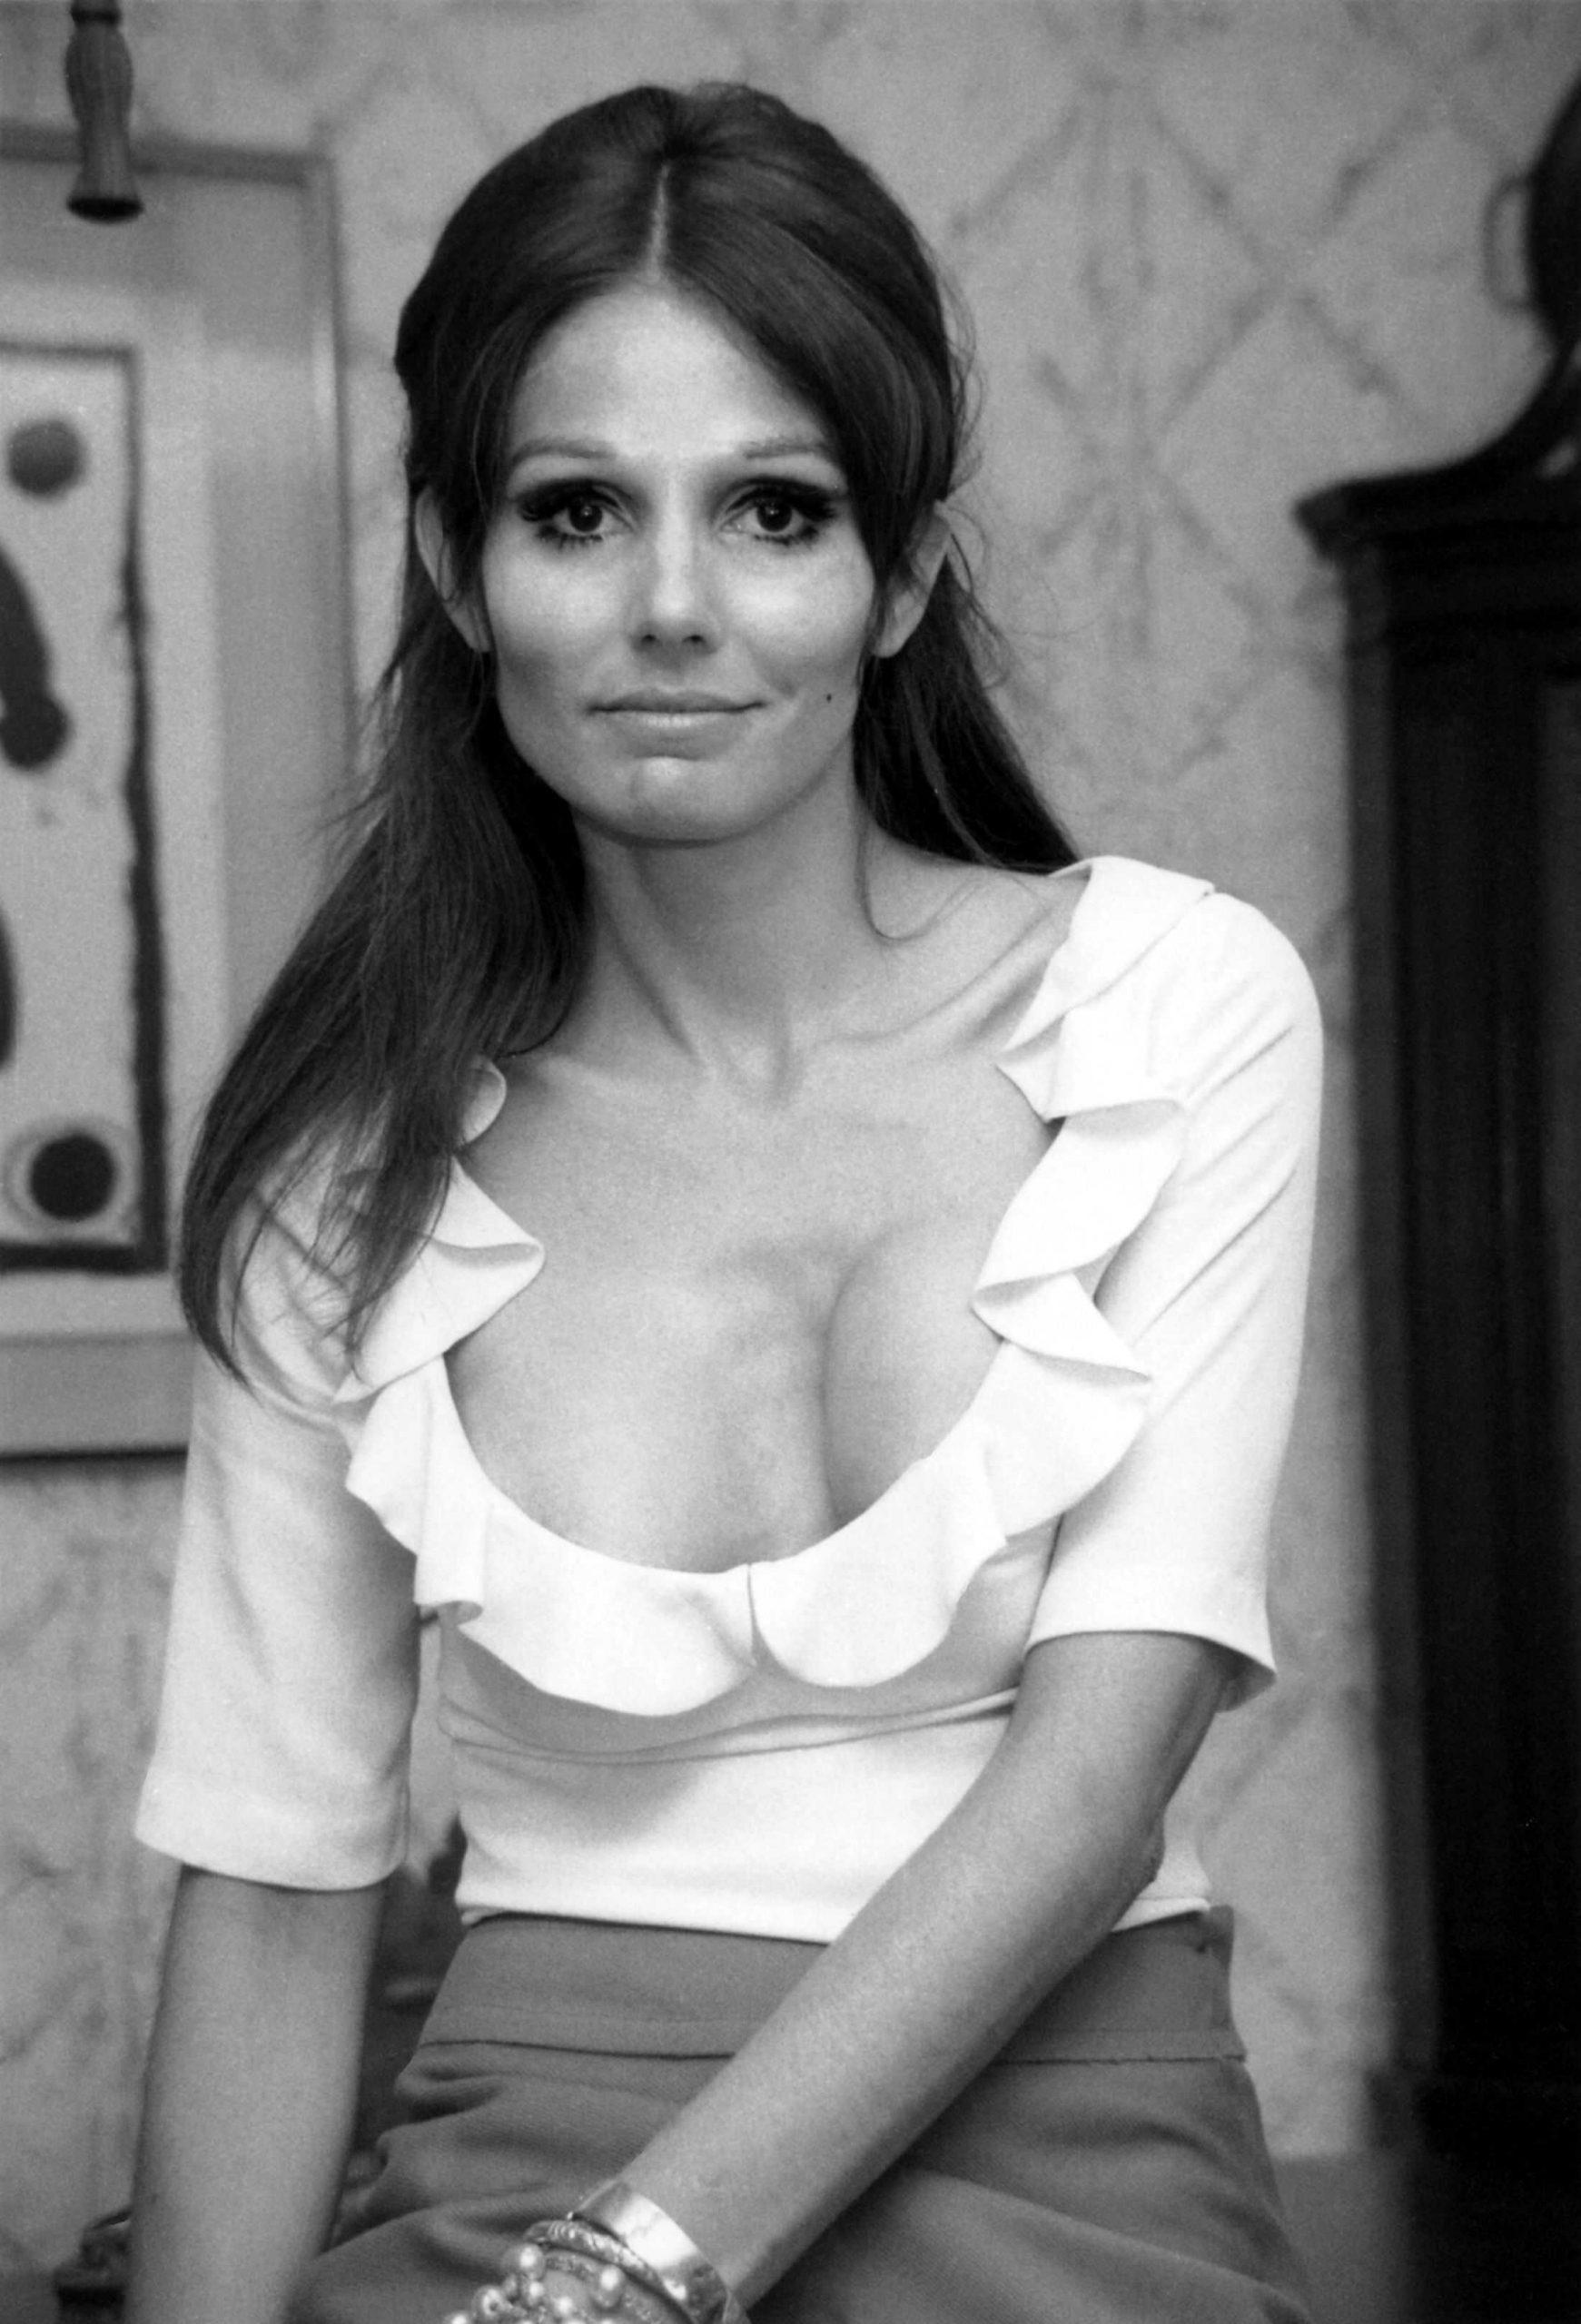 Paula Prentiss sexy cleavage pic